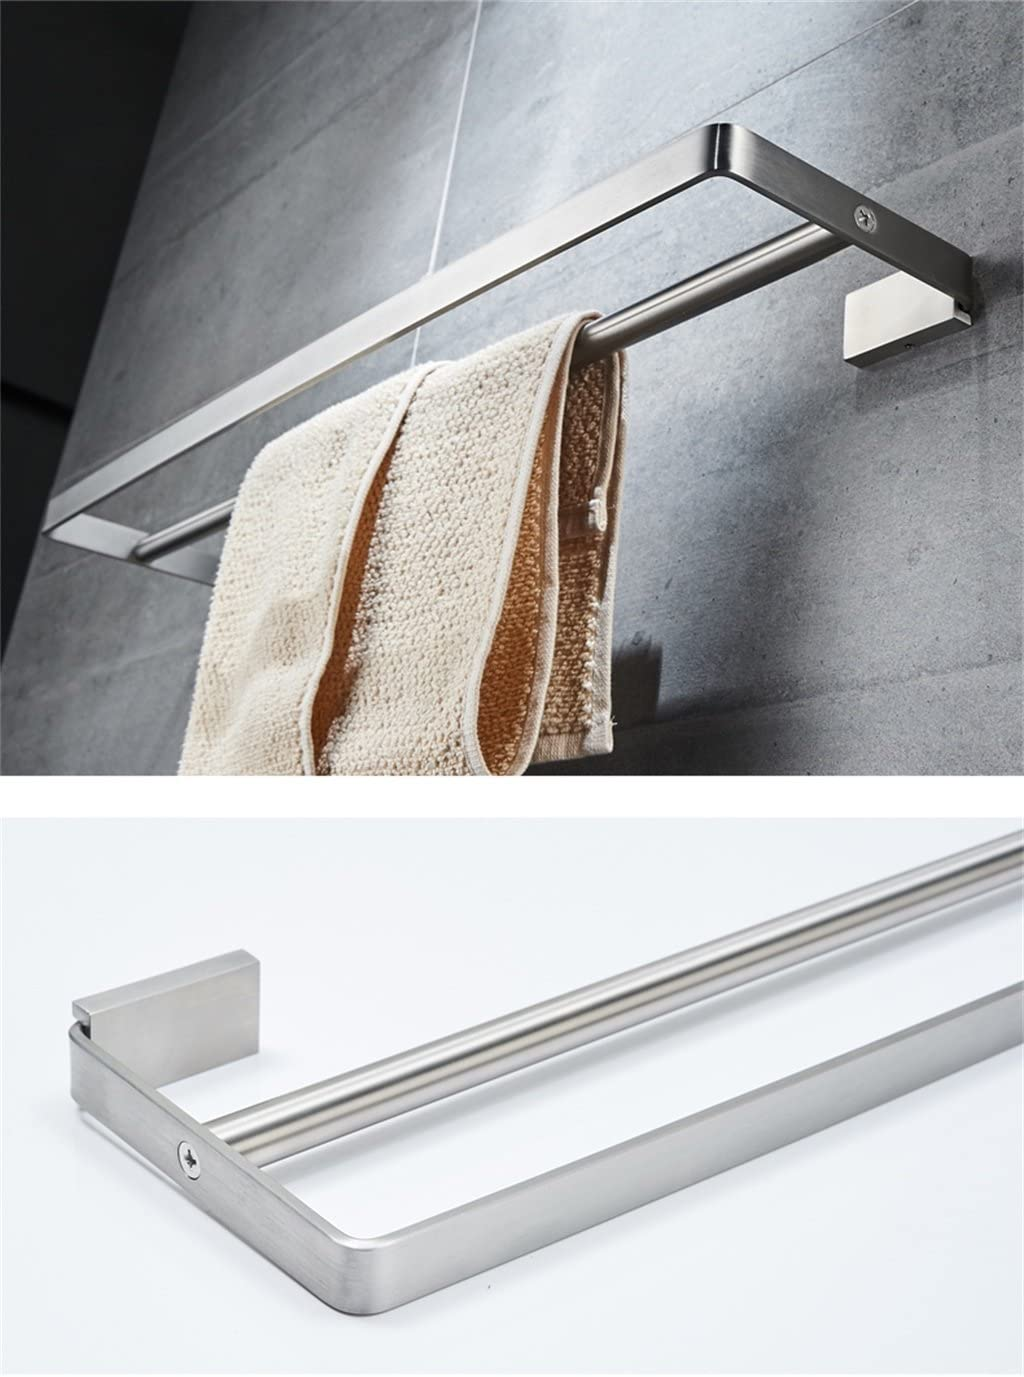 XUEYAN Edelstahl Handtuchhalter Doppel Bar Badezimmer WC